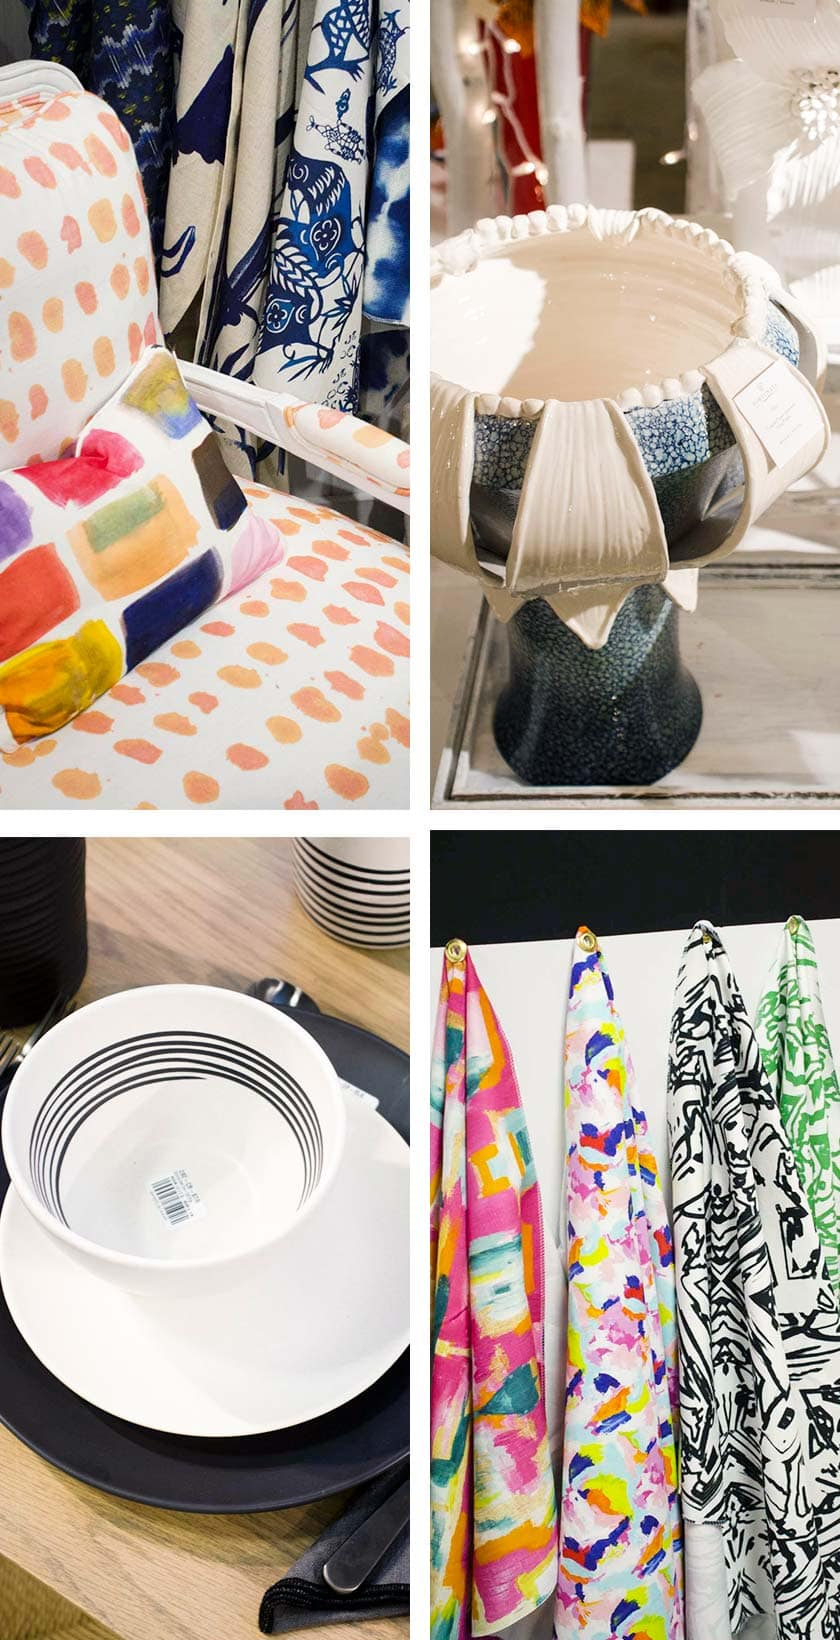 Brushstroke decor trend from AmericasMart on Thou Swell @thouswellblog